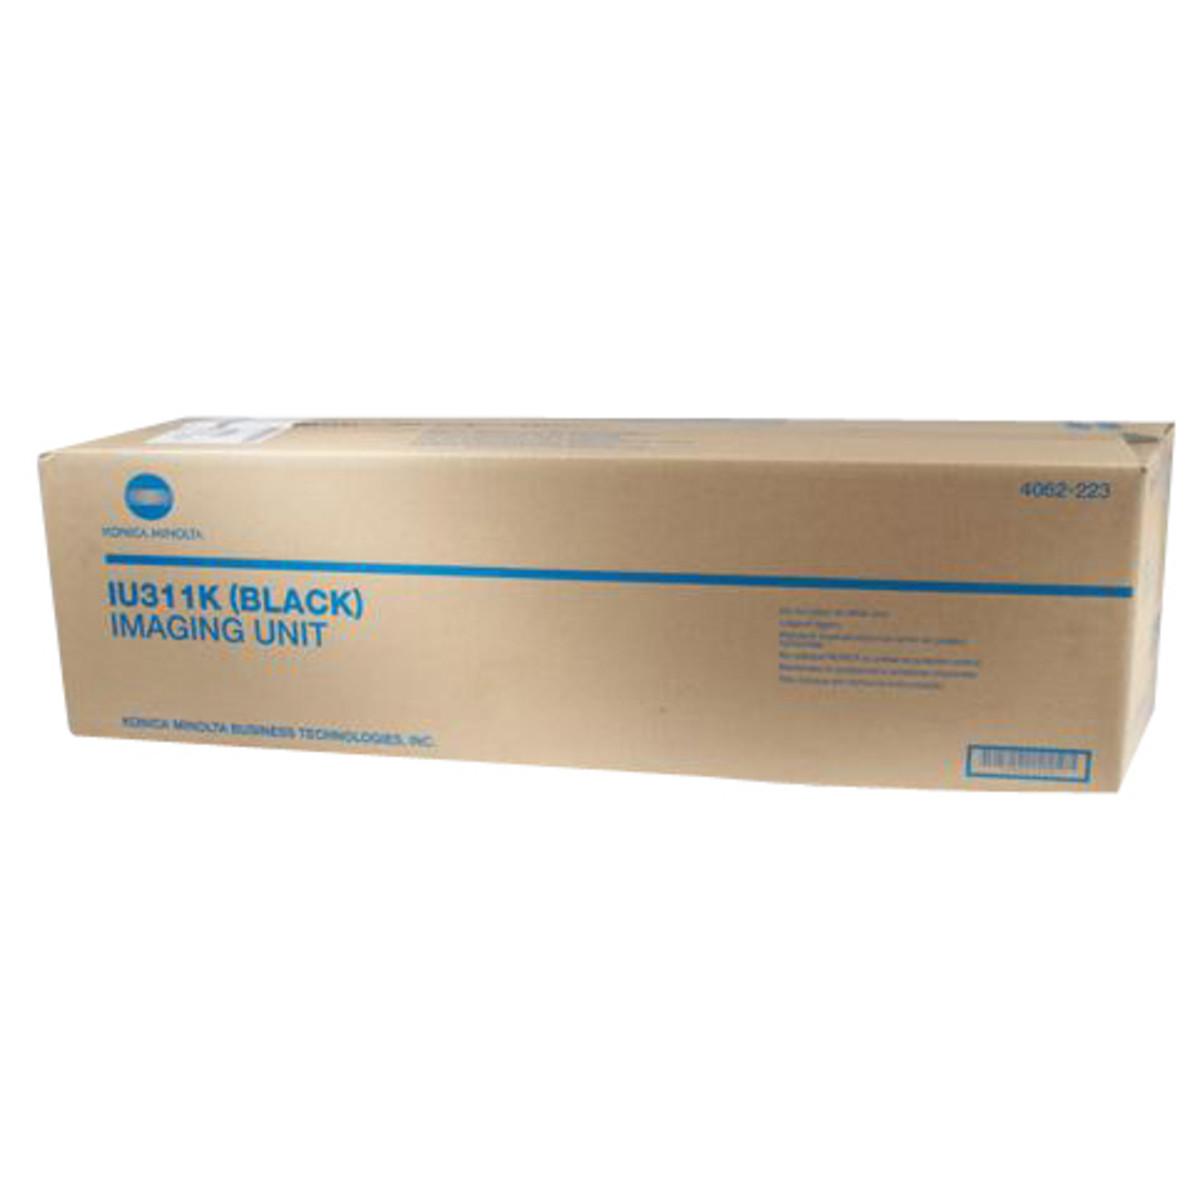 Konica Minolta 4062-223 Black Drum Unit